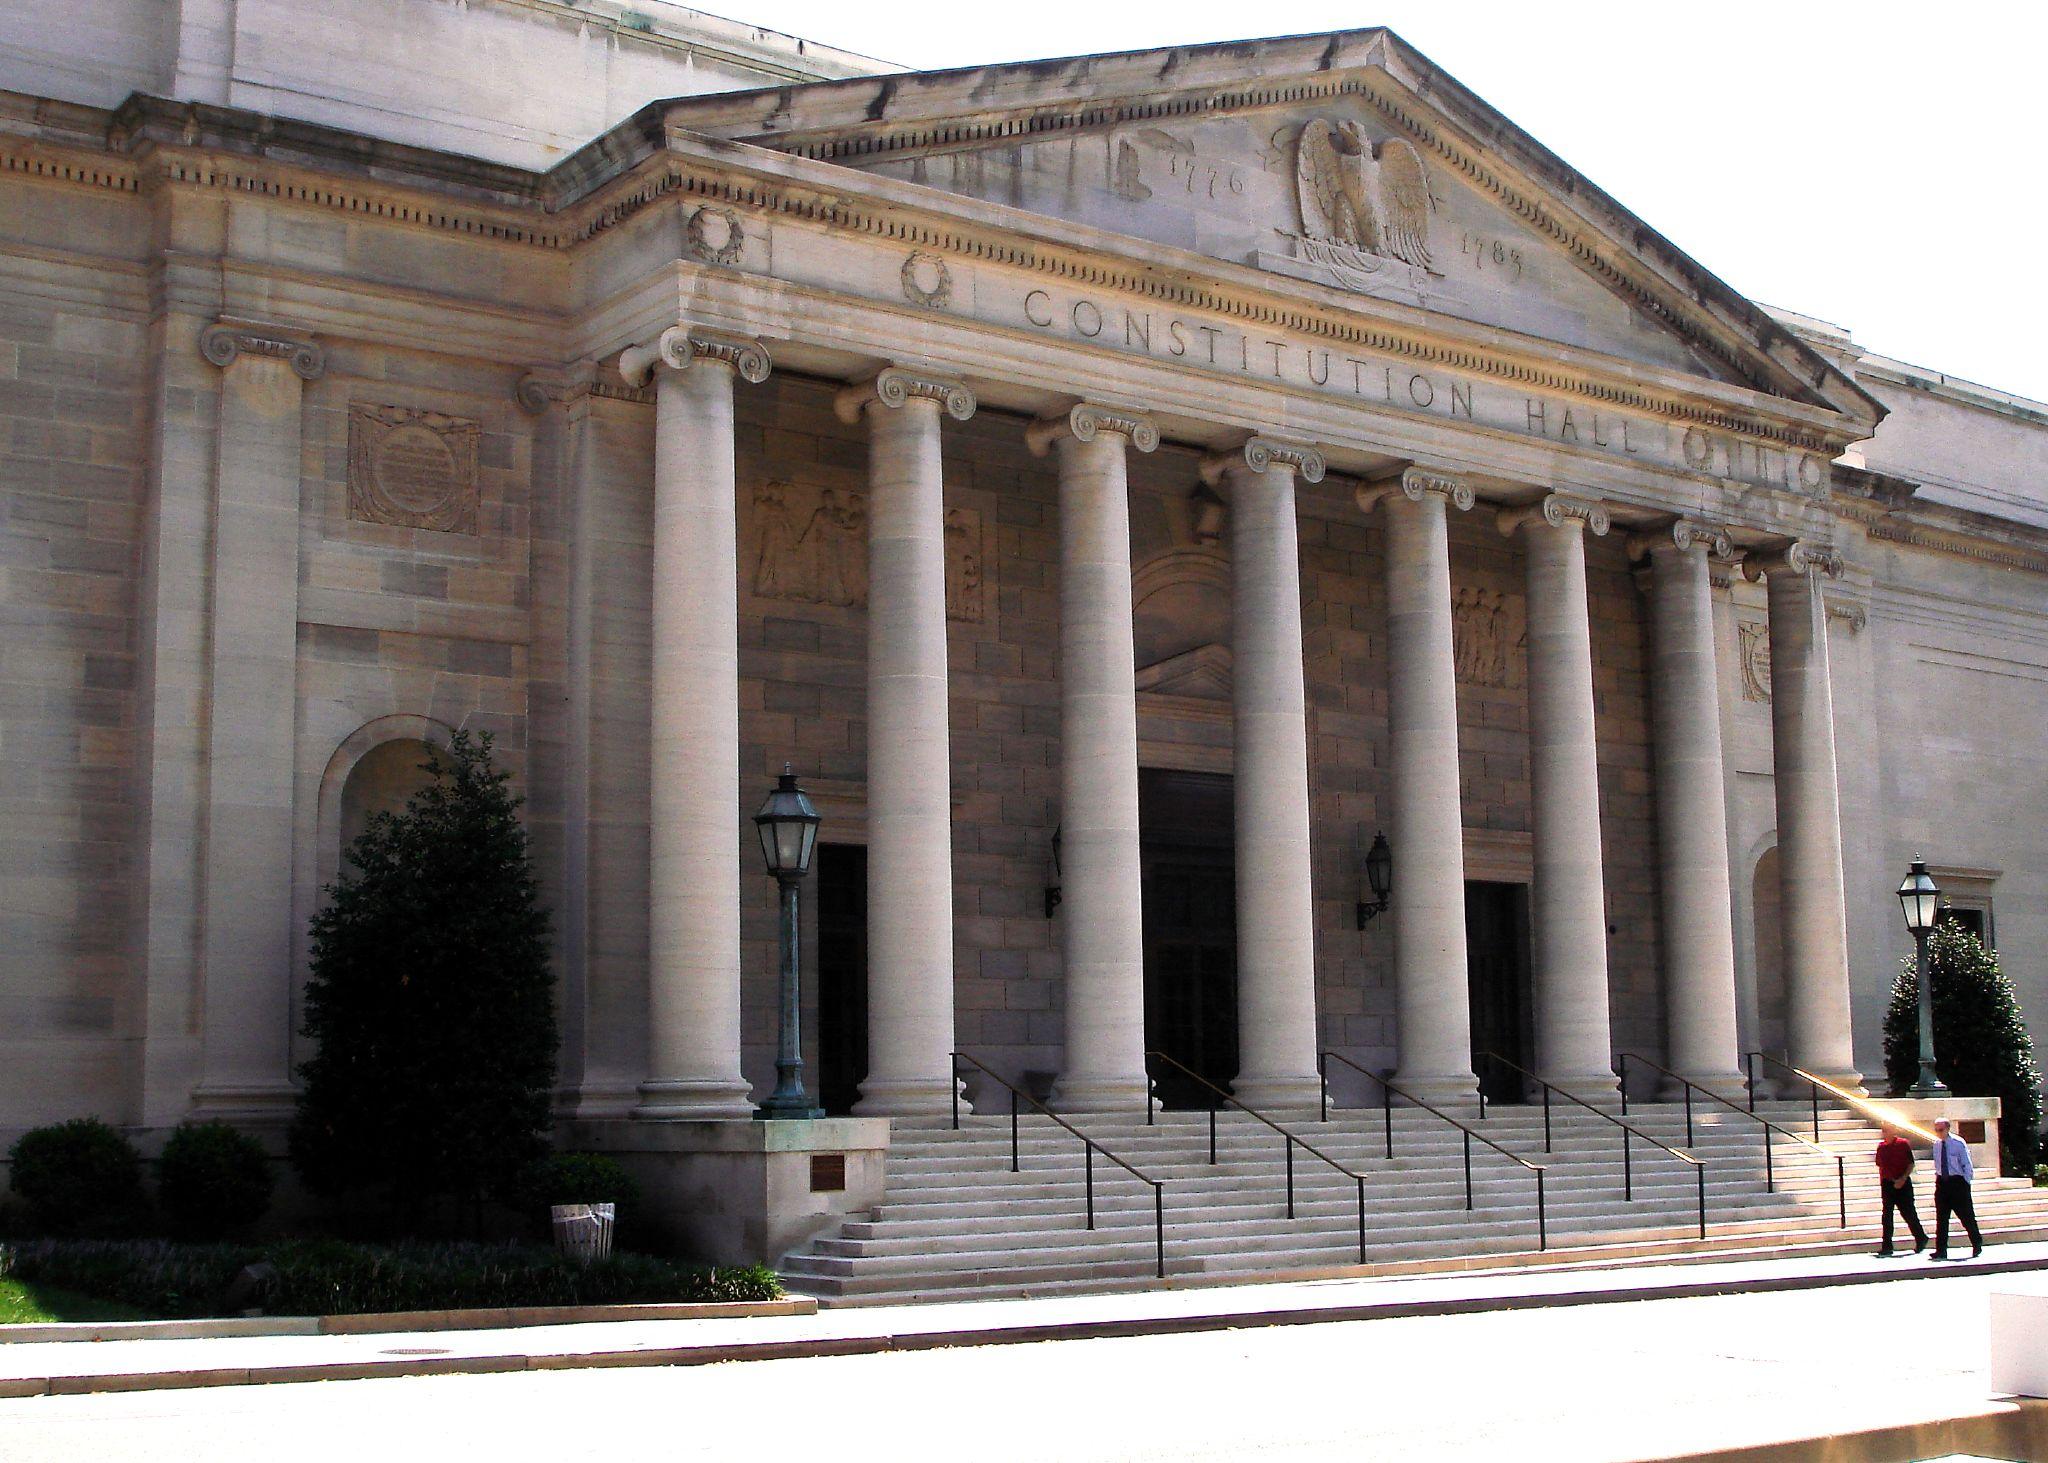 [[DAR Constitution Hall]], Washington, DC